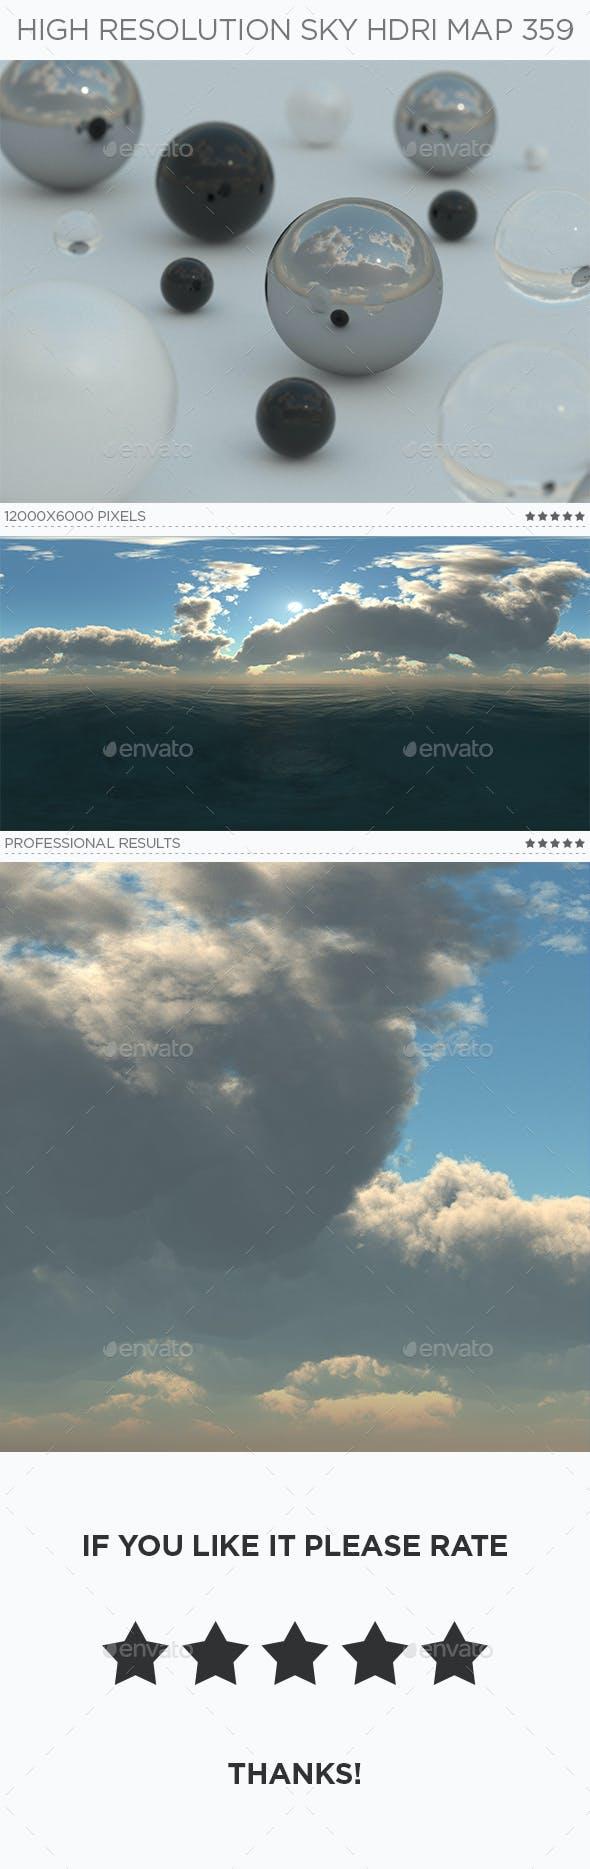 High Resolution Sky HDRi Map 359 - 3DOcean Item for Sale